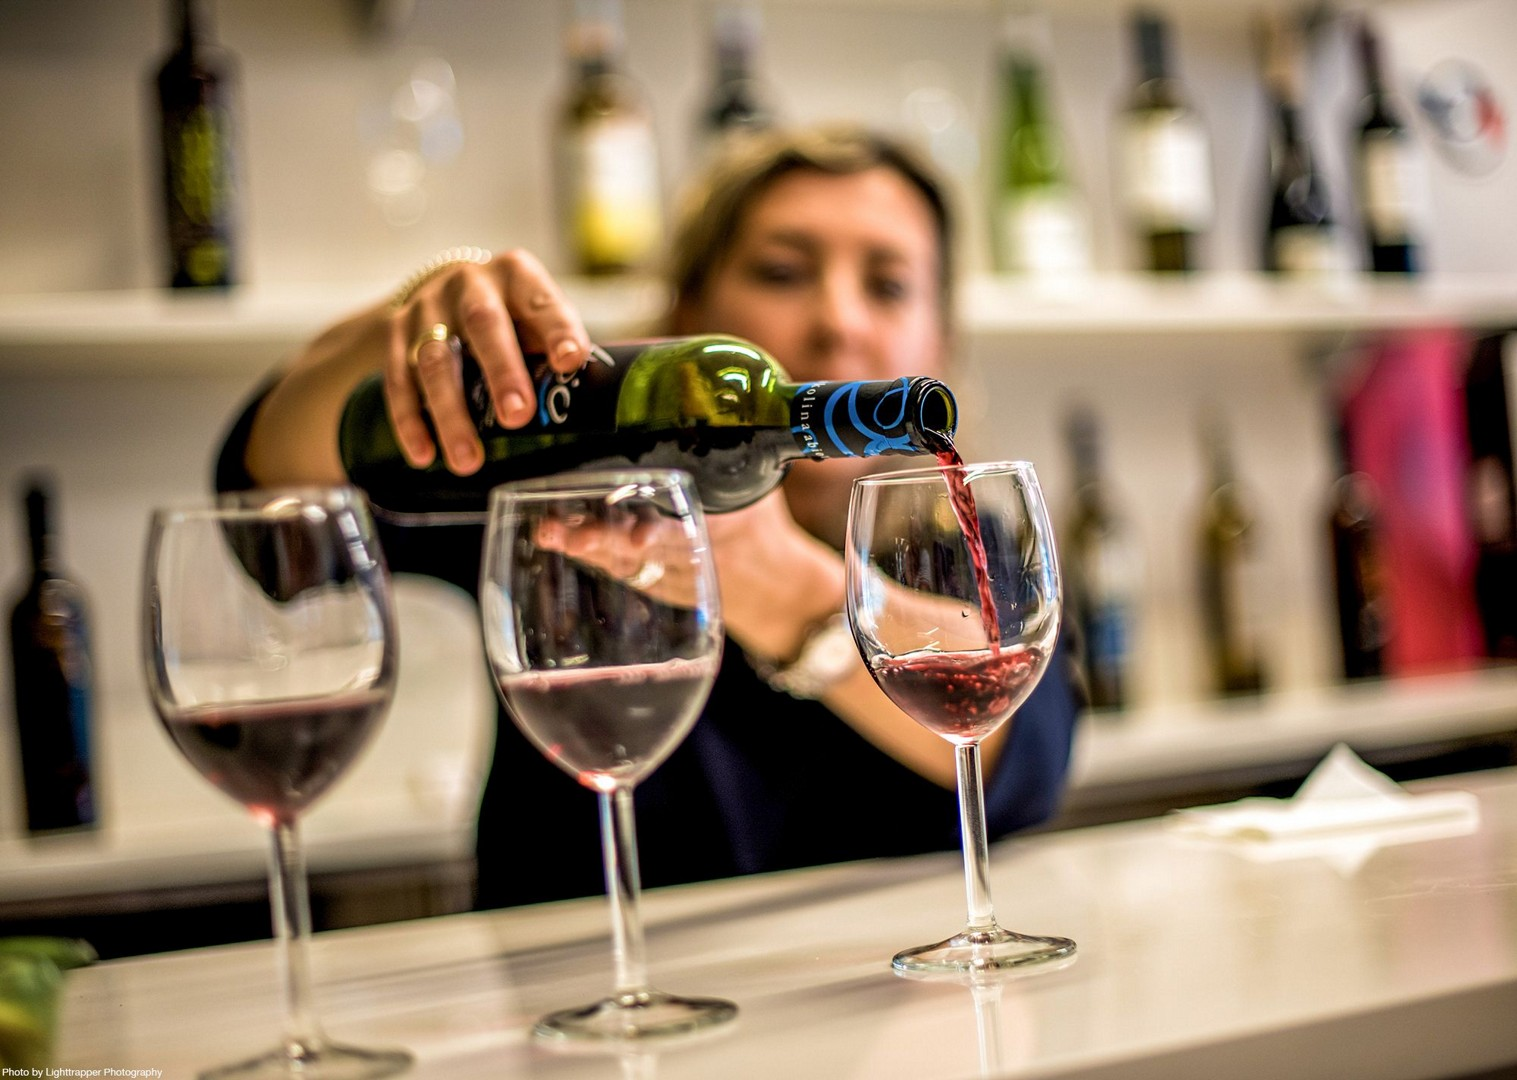 wine-tasting-spain-cycling-holiday-self-guided.jpg - NEW! Spain - Bilbao to San Sebastian - Leisure Cycling